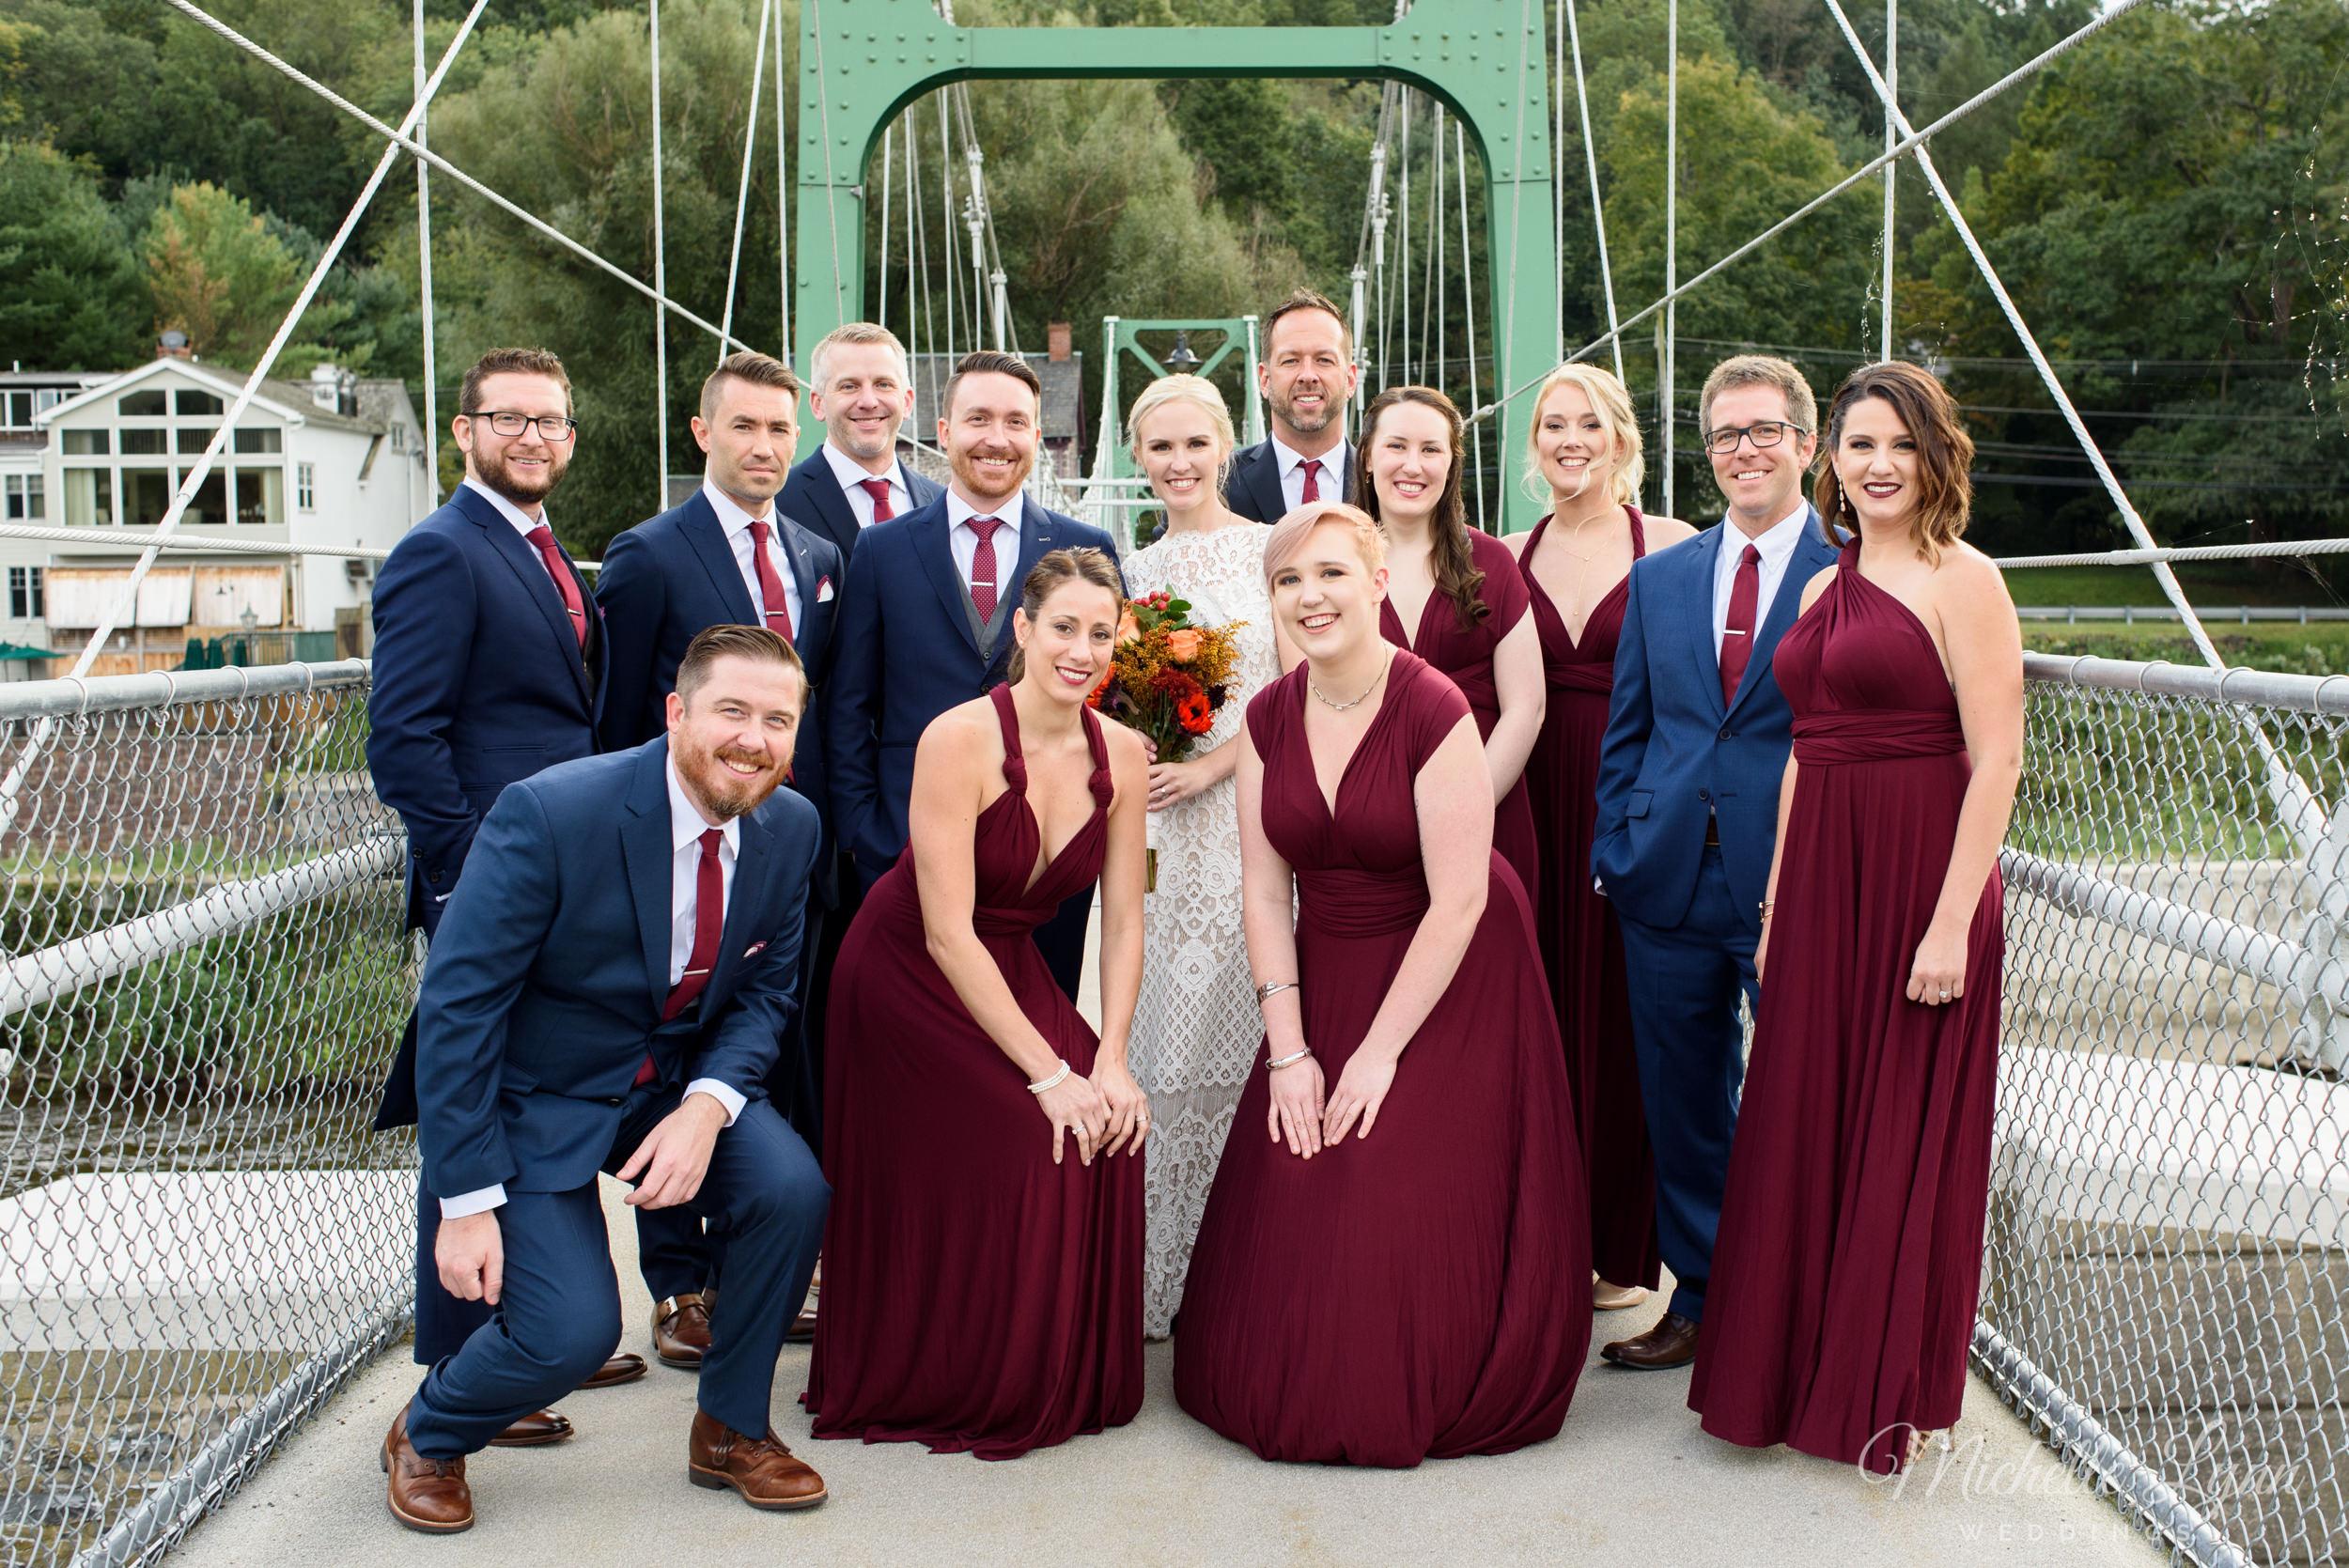 mlw-lumberville-general-store-new-hope-wedding-photographer-25.jpg